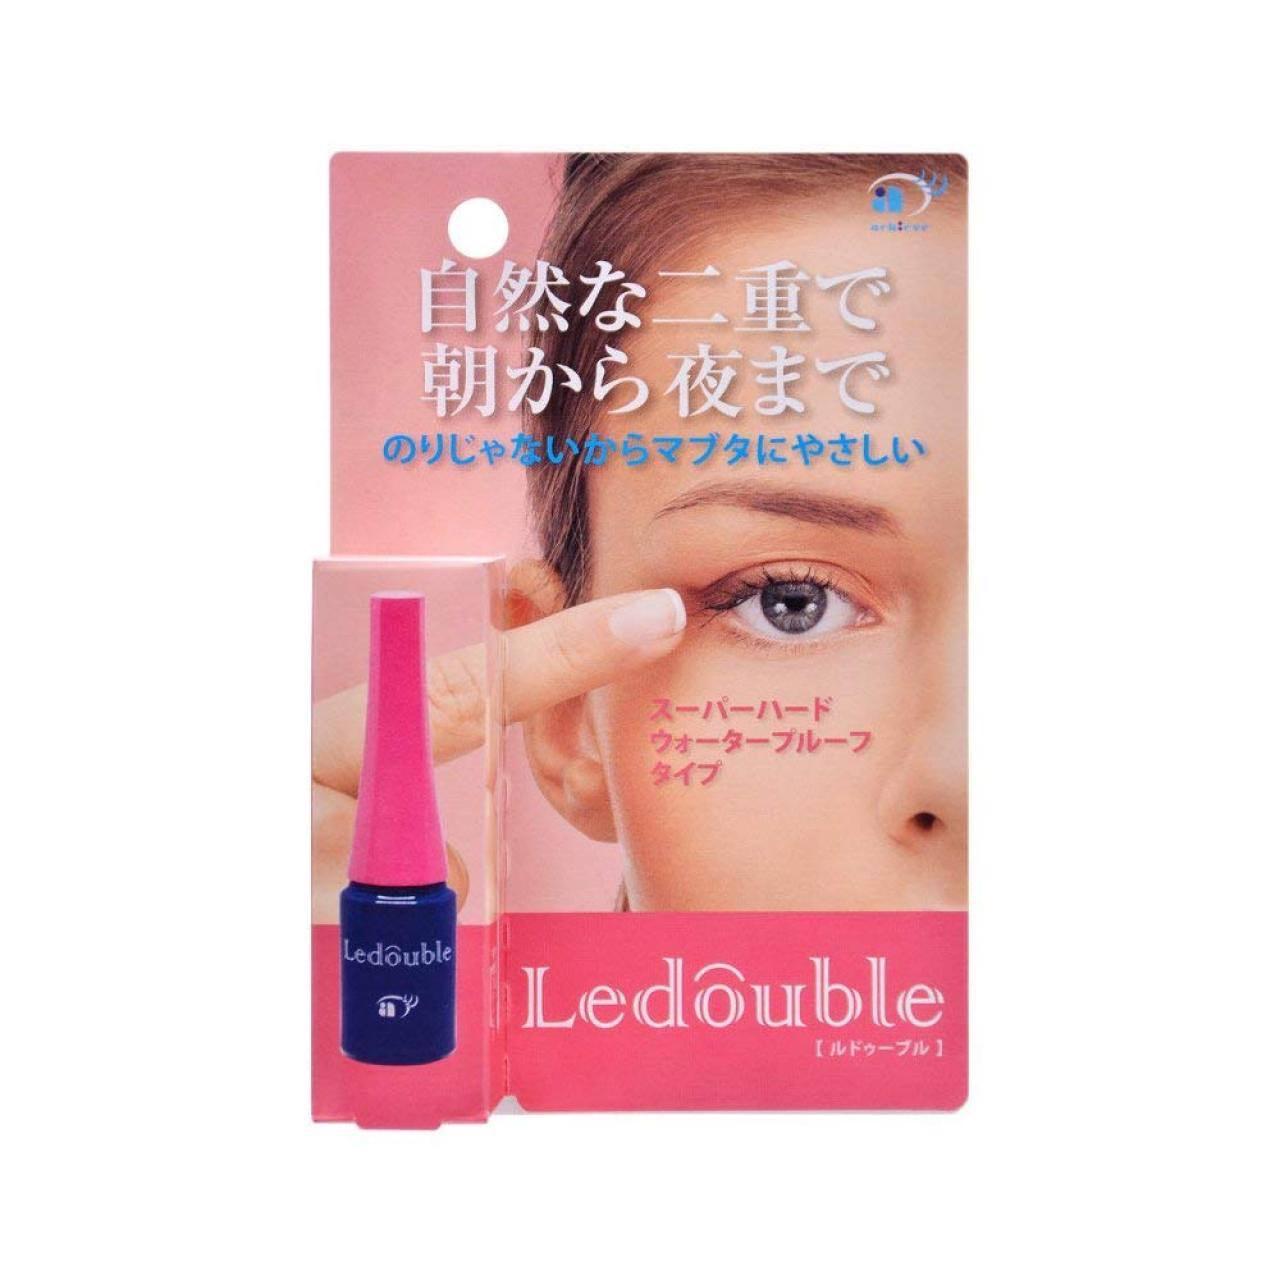 Ledouble [ルドゥーブル] 二重まぶた化粧品 (2mL)<br/>